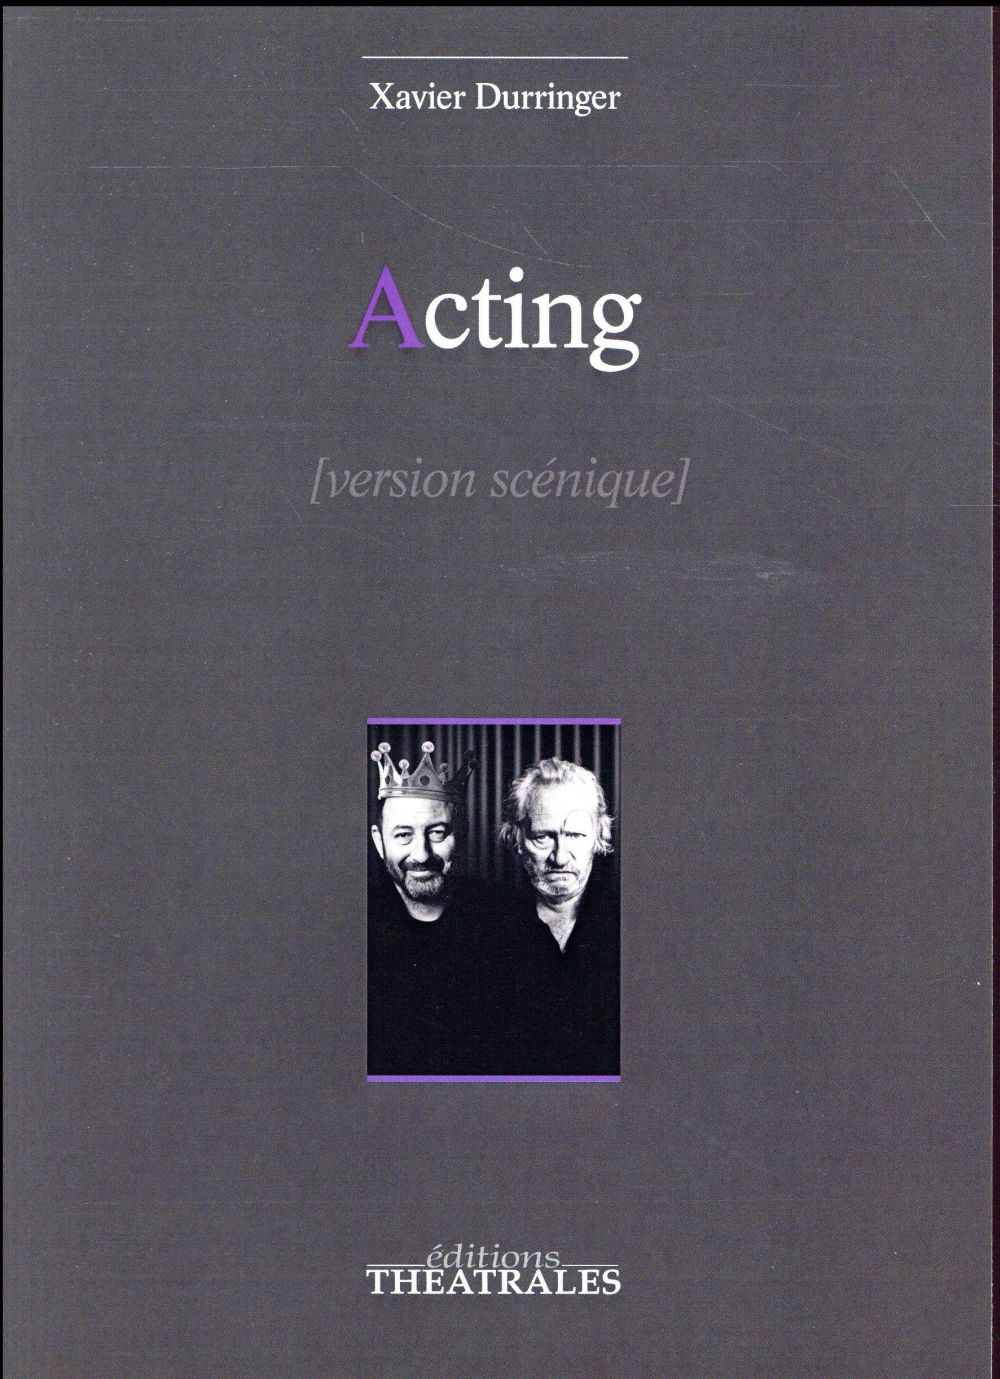 Acting ; version scénique 2016